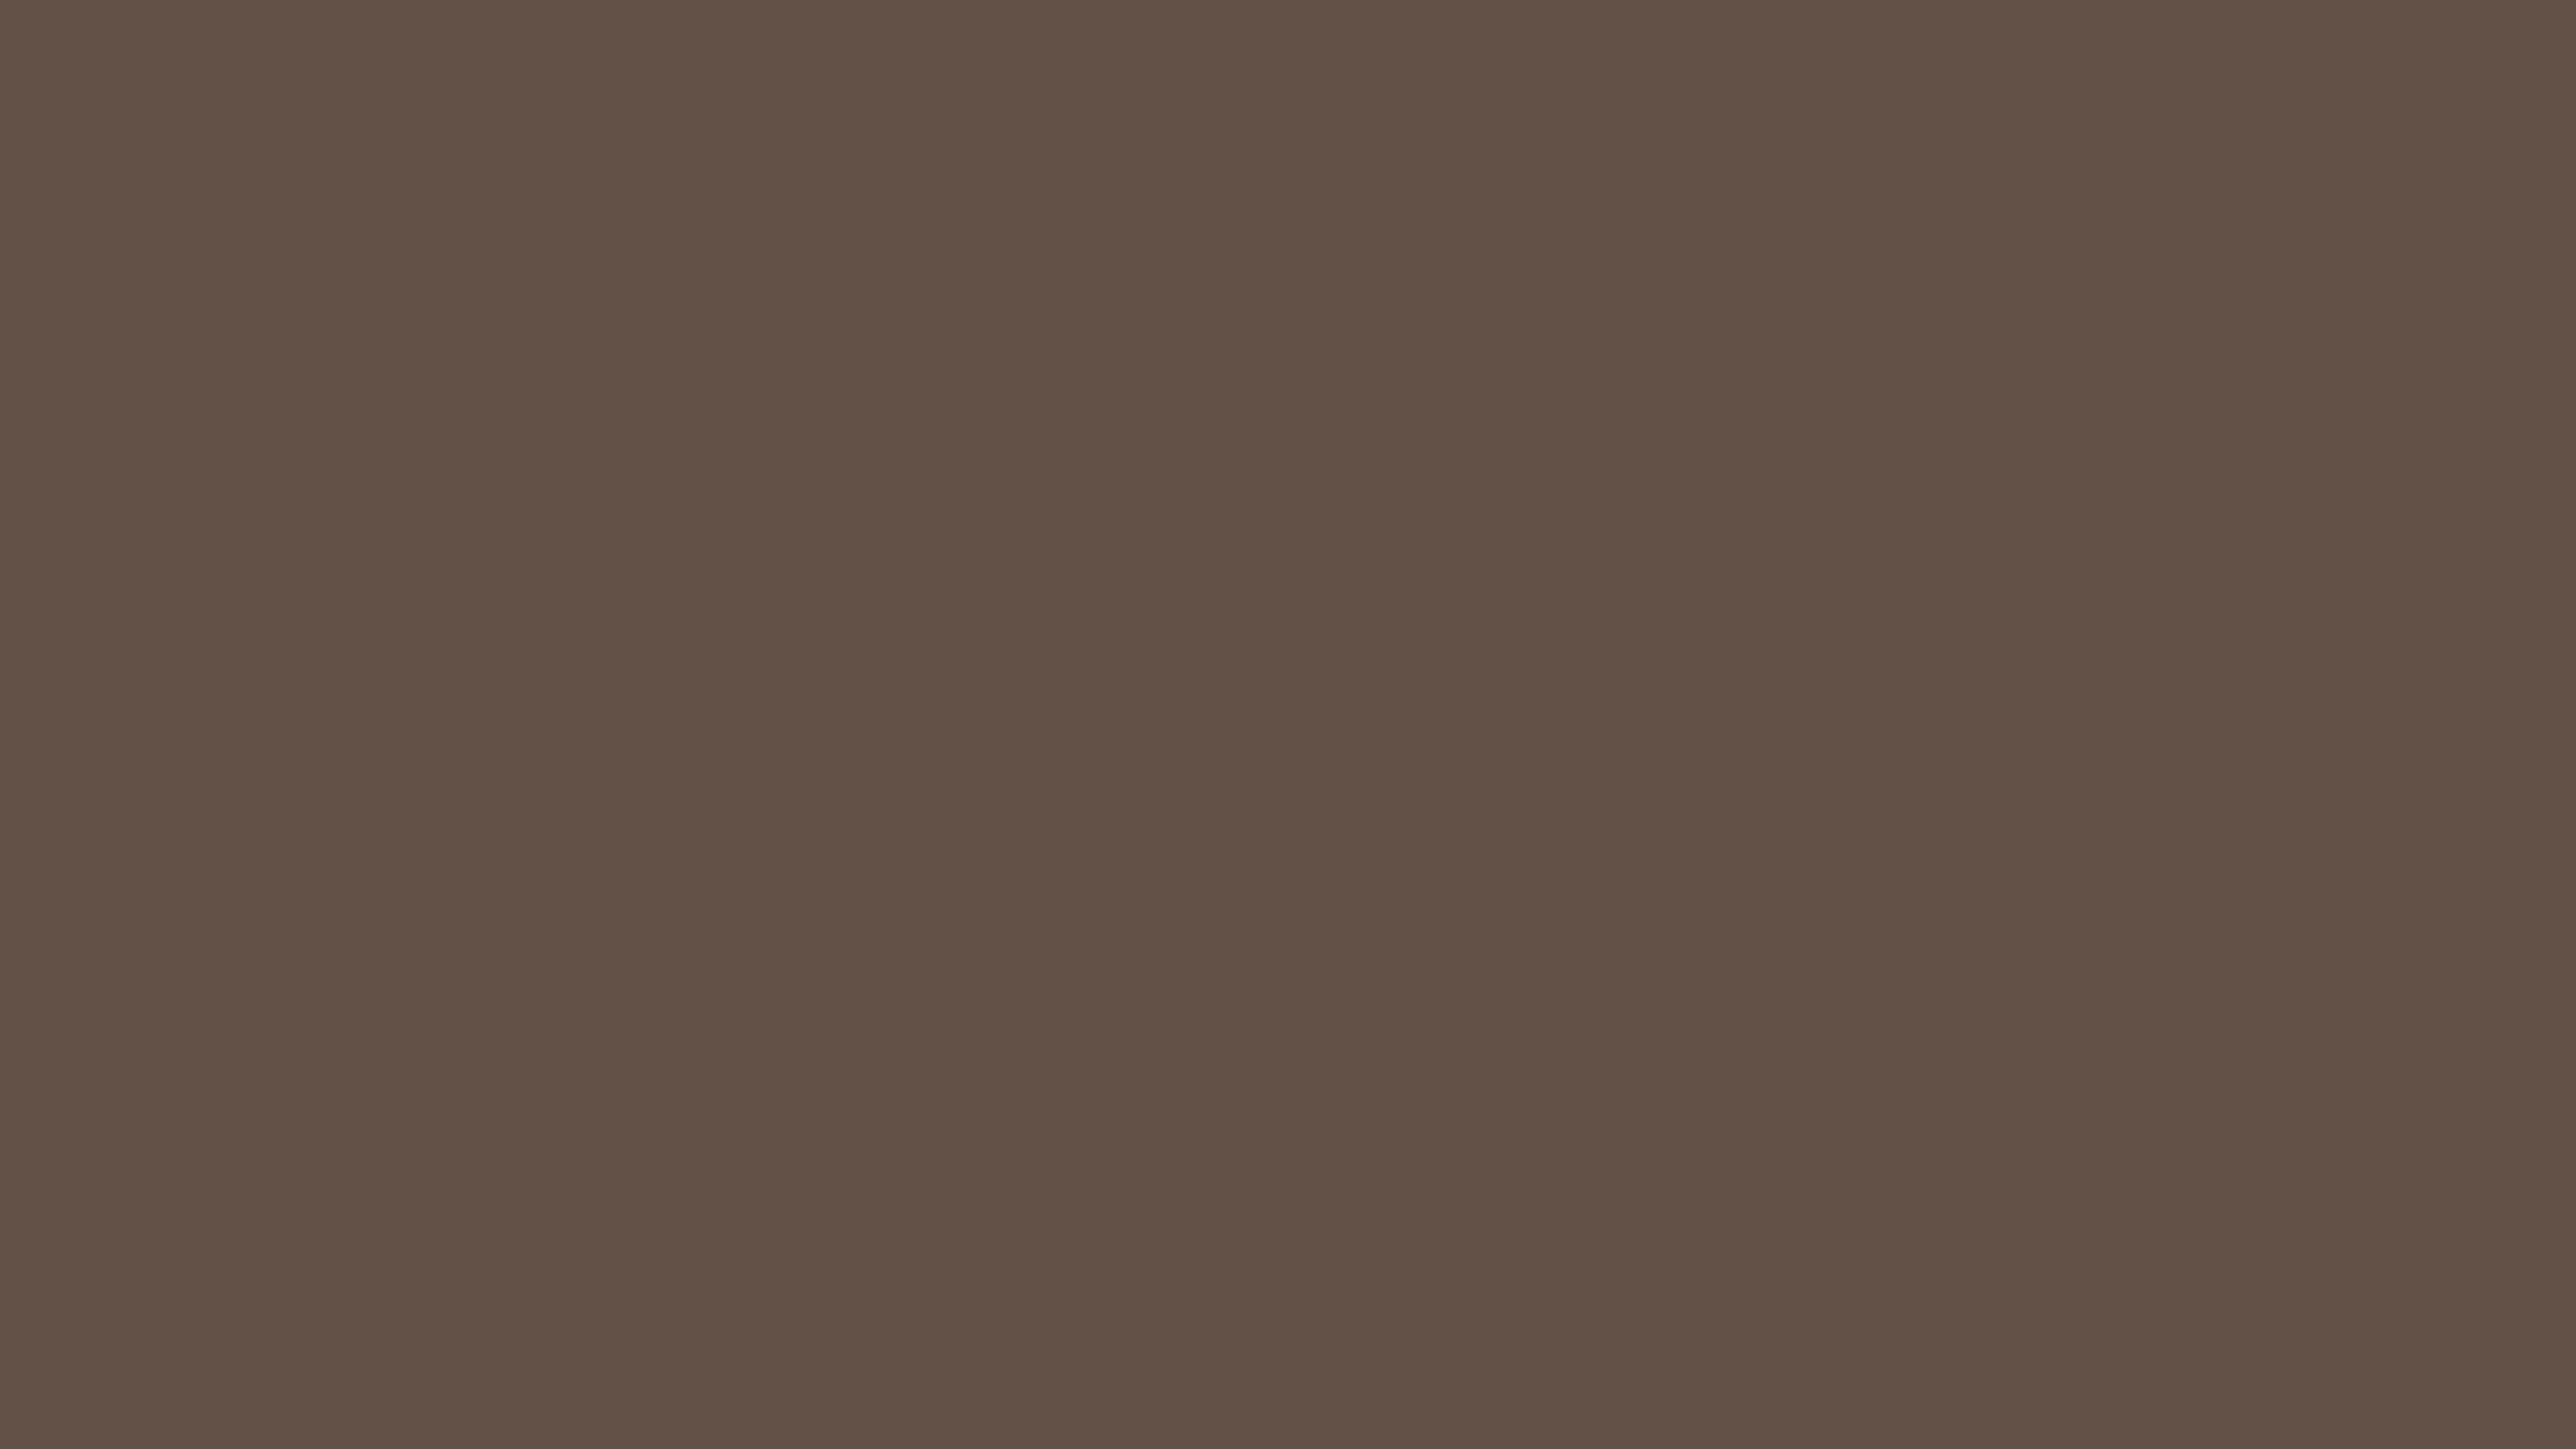 3840x2160 Umber Solid Color Background